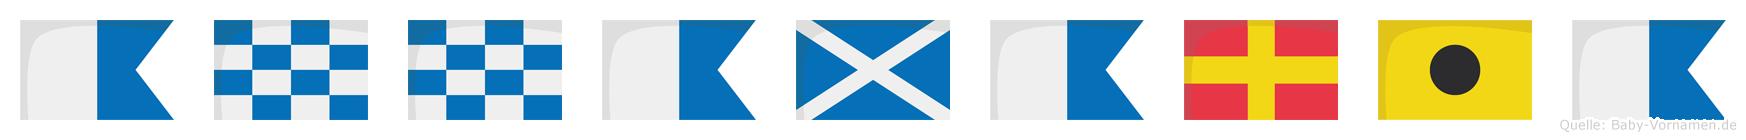 Annamaria im Flaggenalphabet